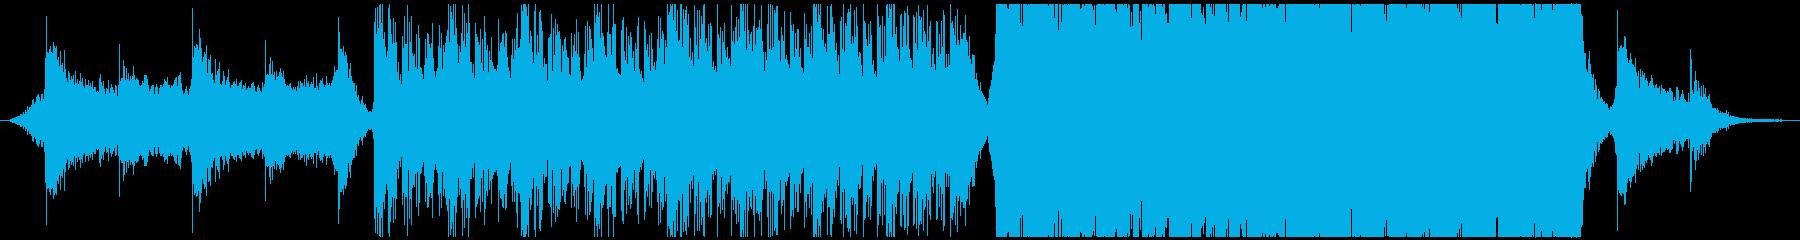 Strike VIの再生済みの波形